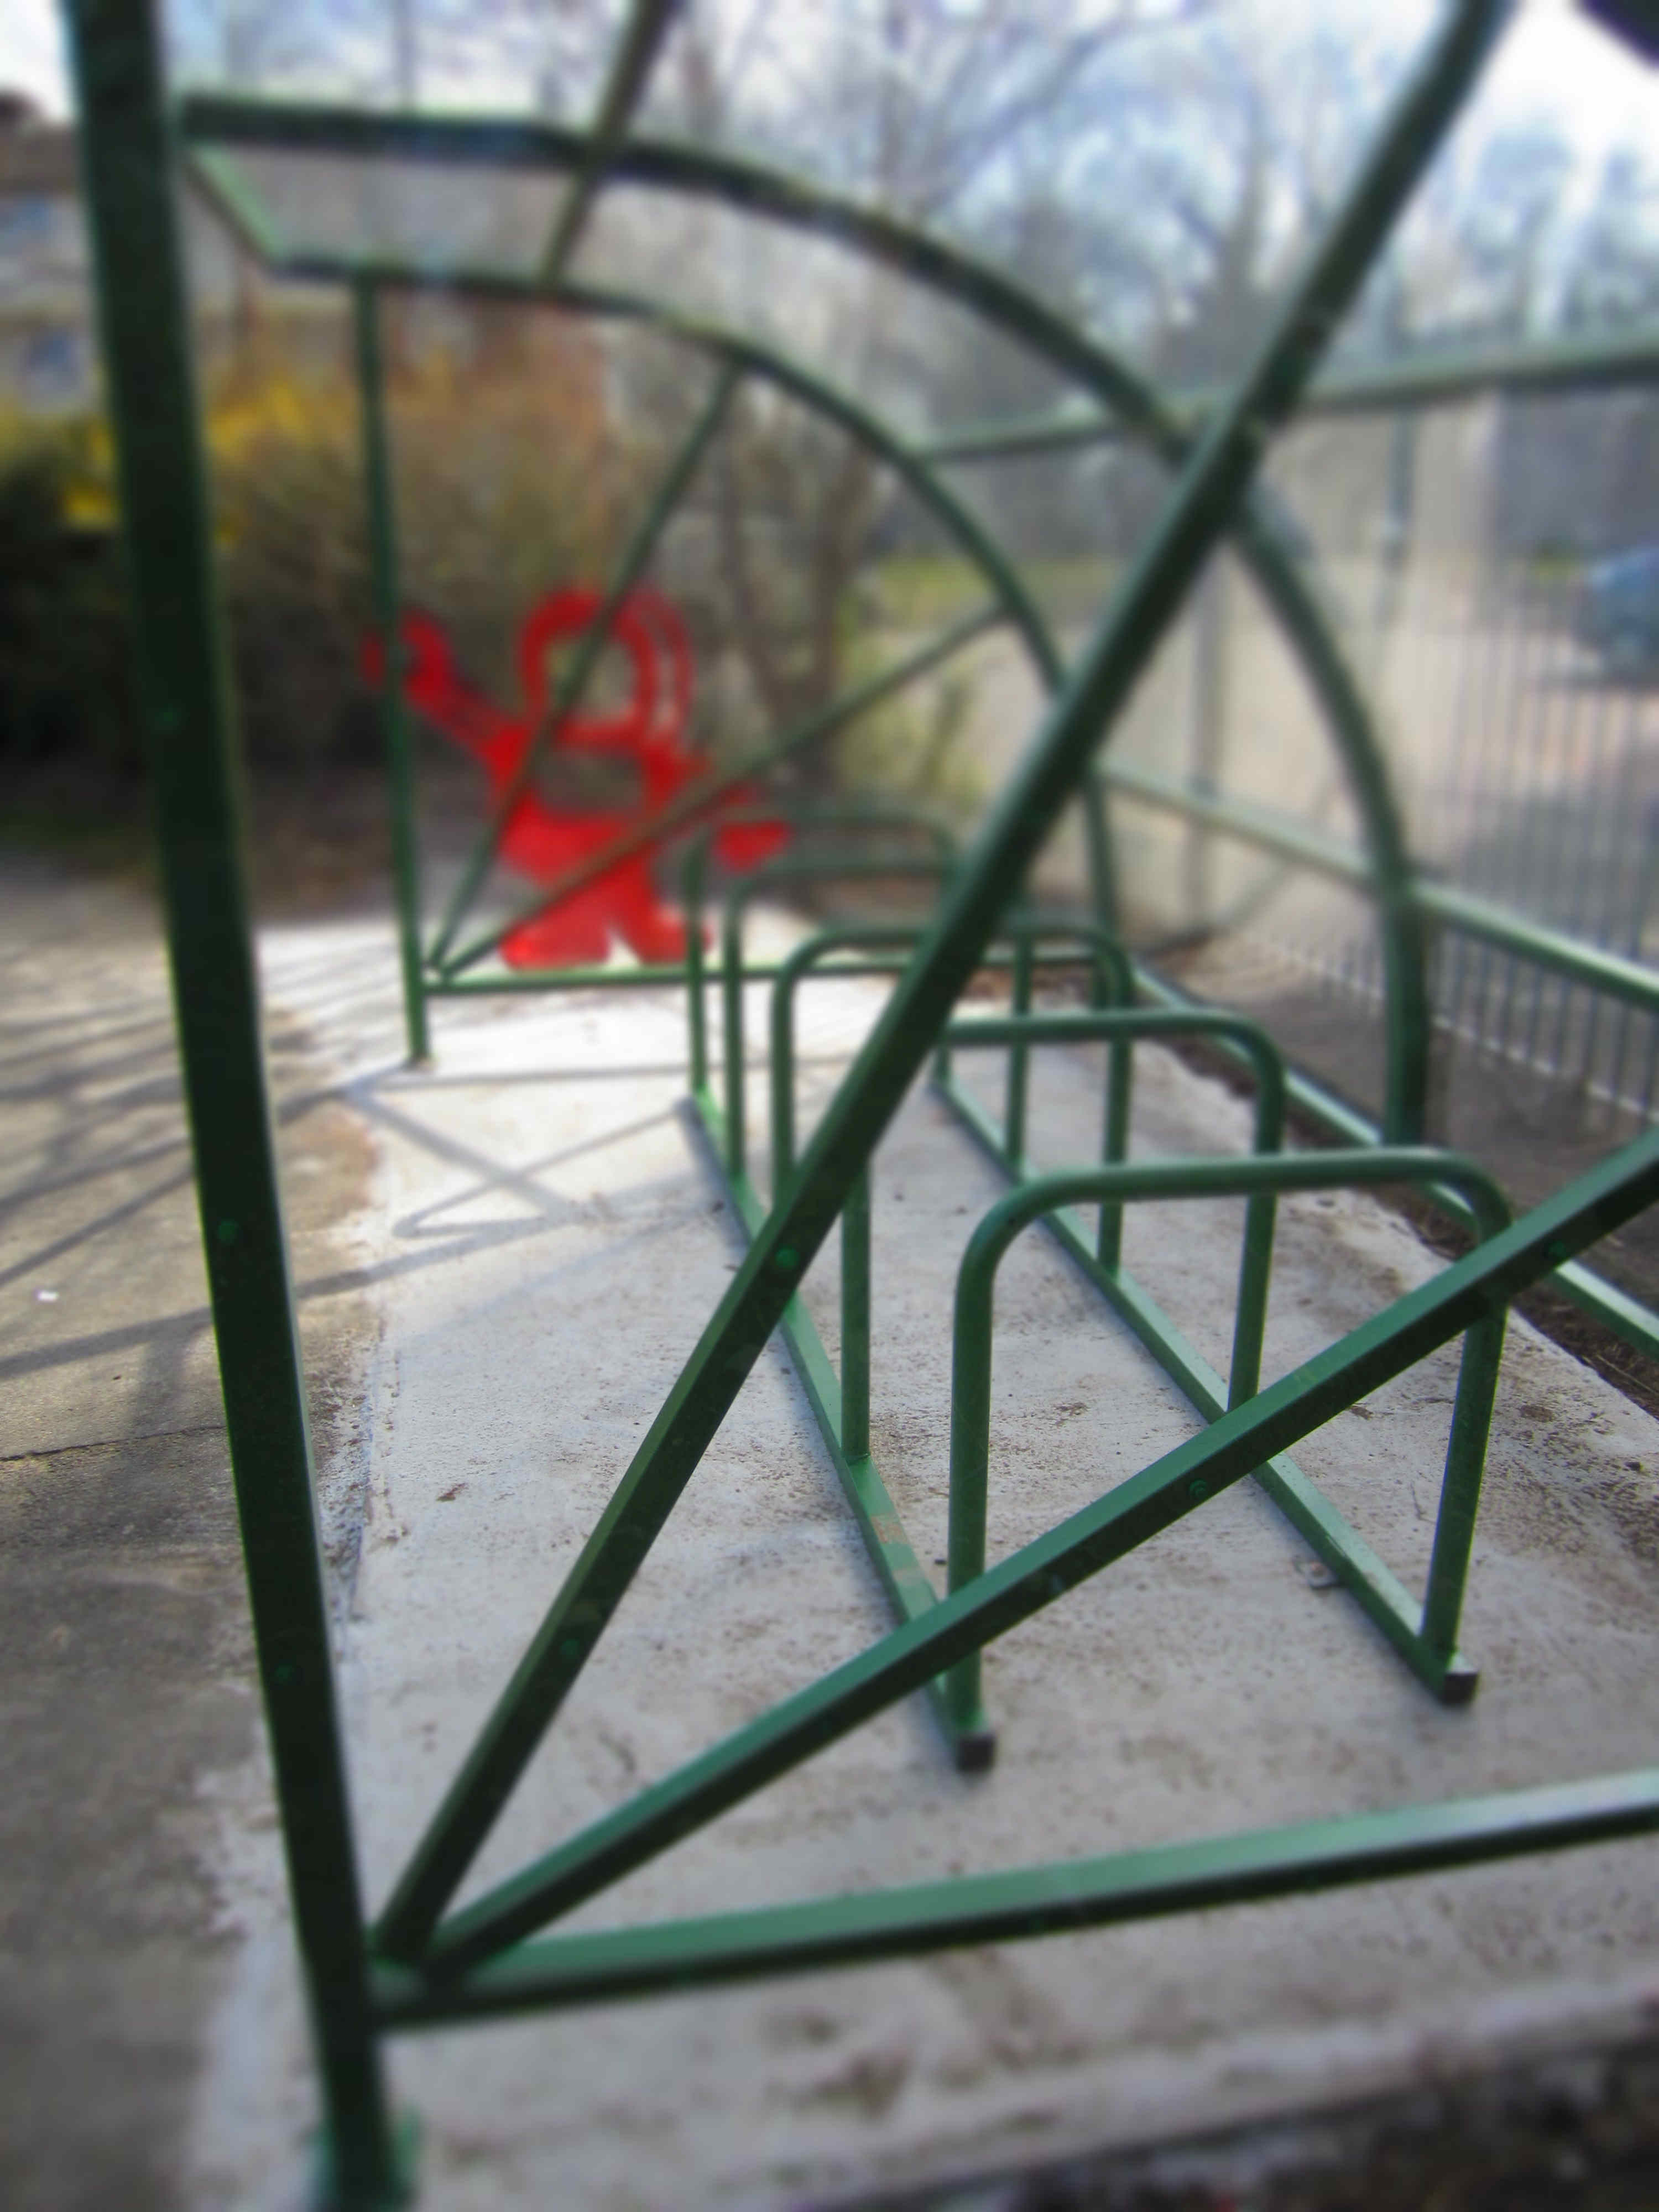 Bike And Scooter Racks Installed Coryton Primary School Pta